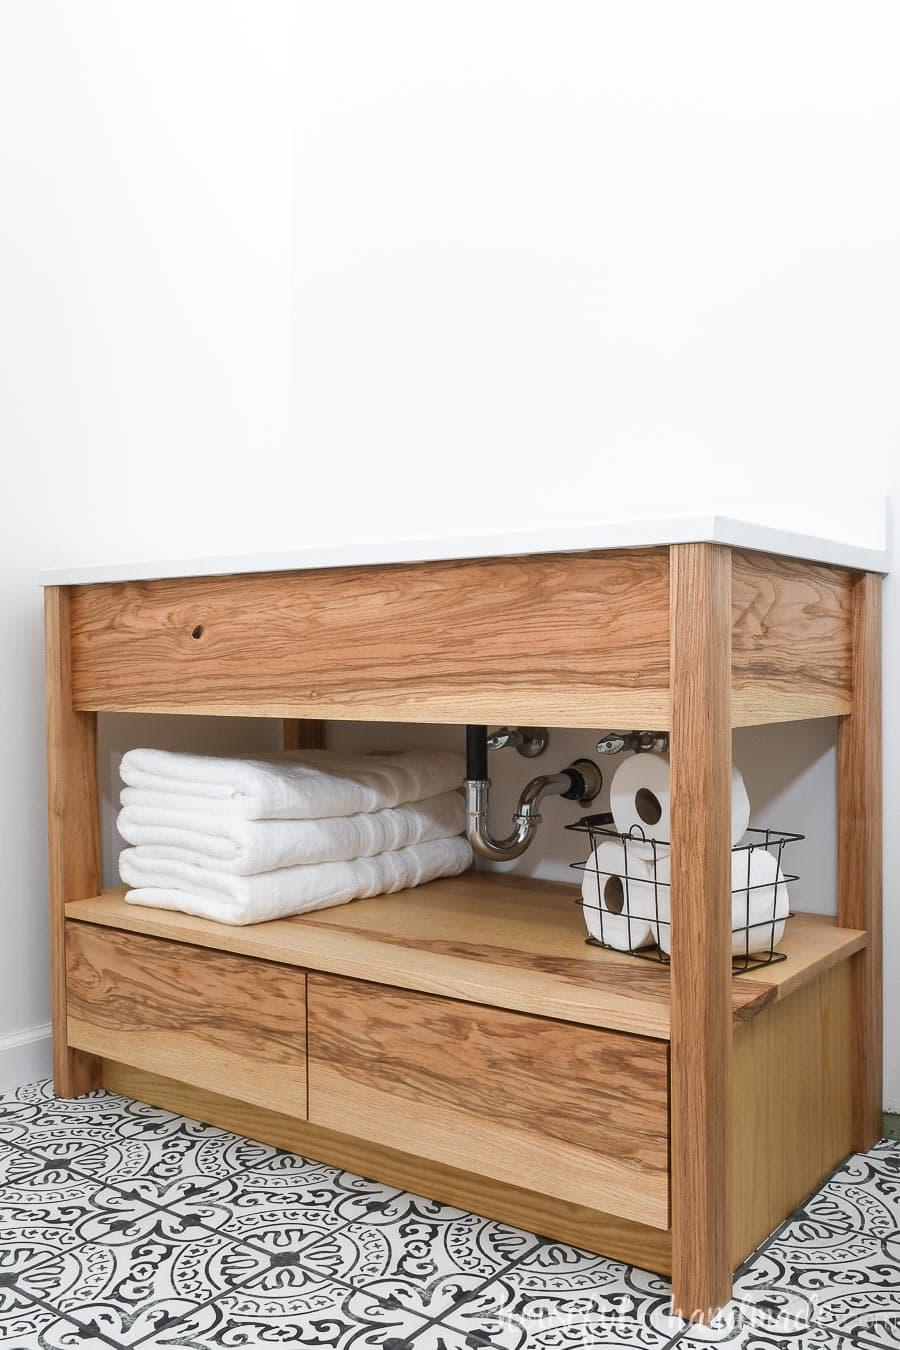 Diy Bathroom Vanity With Bottom Drawers Houseful Of Handmade